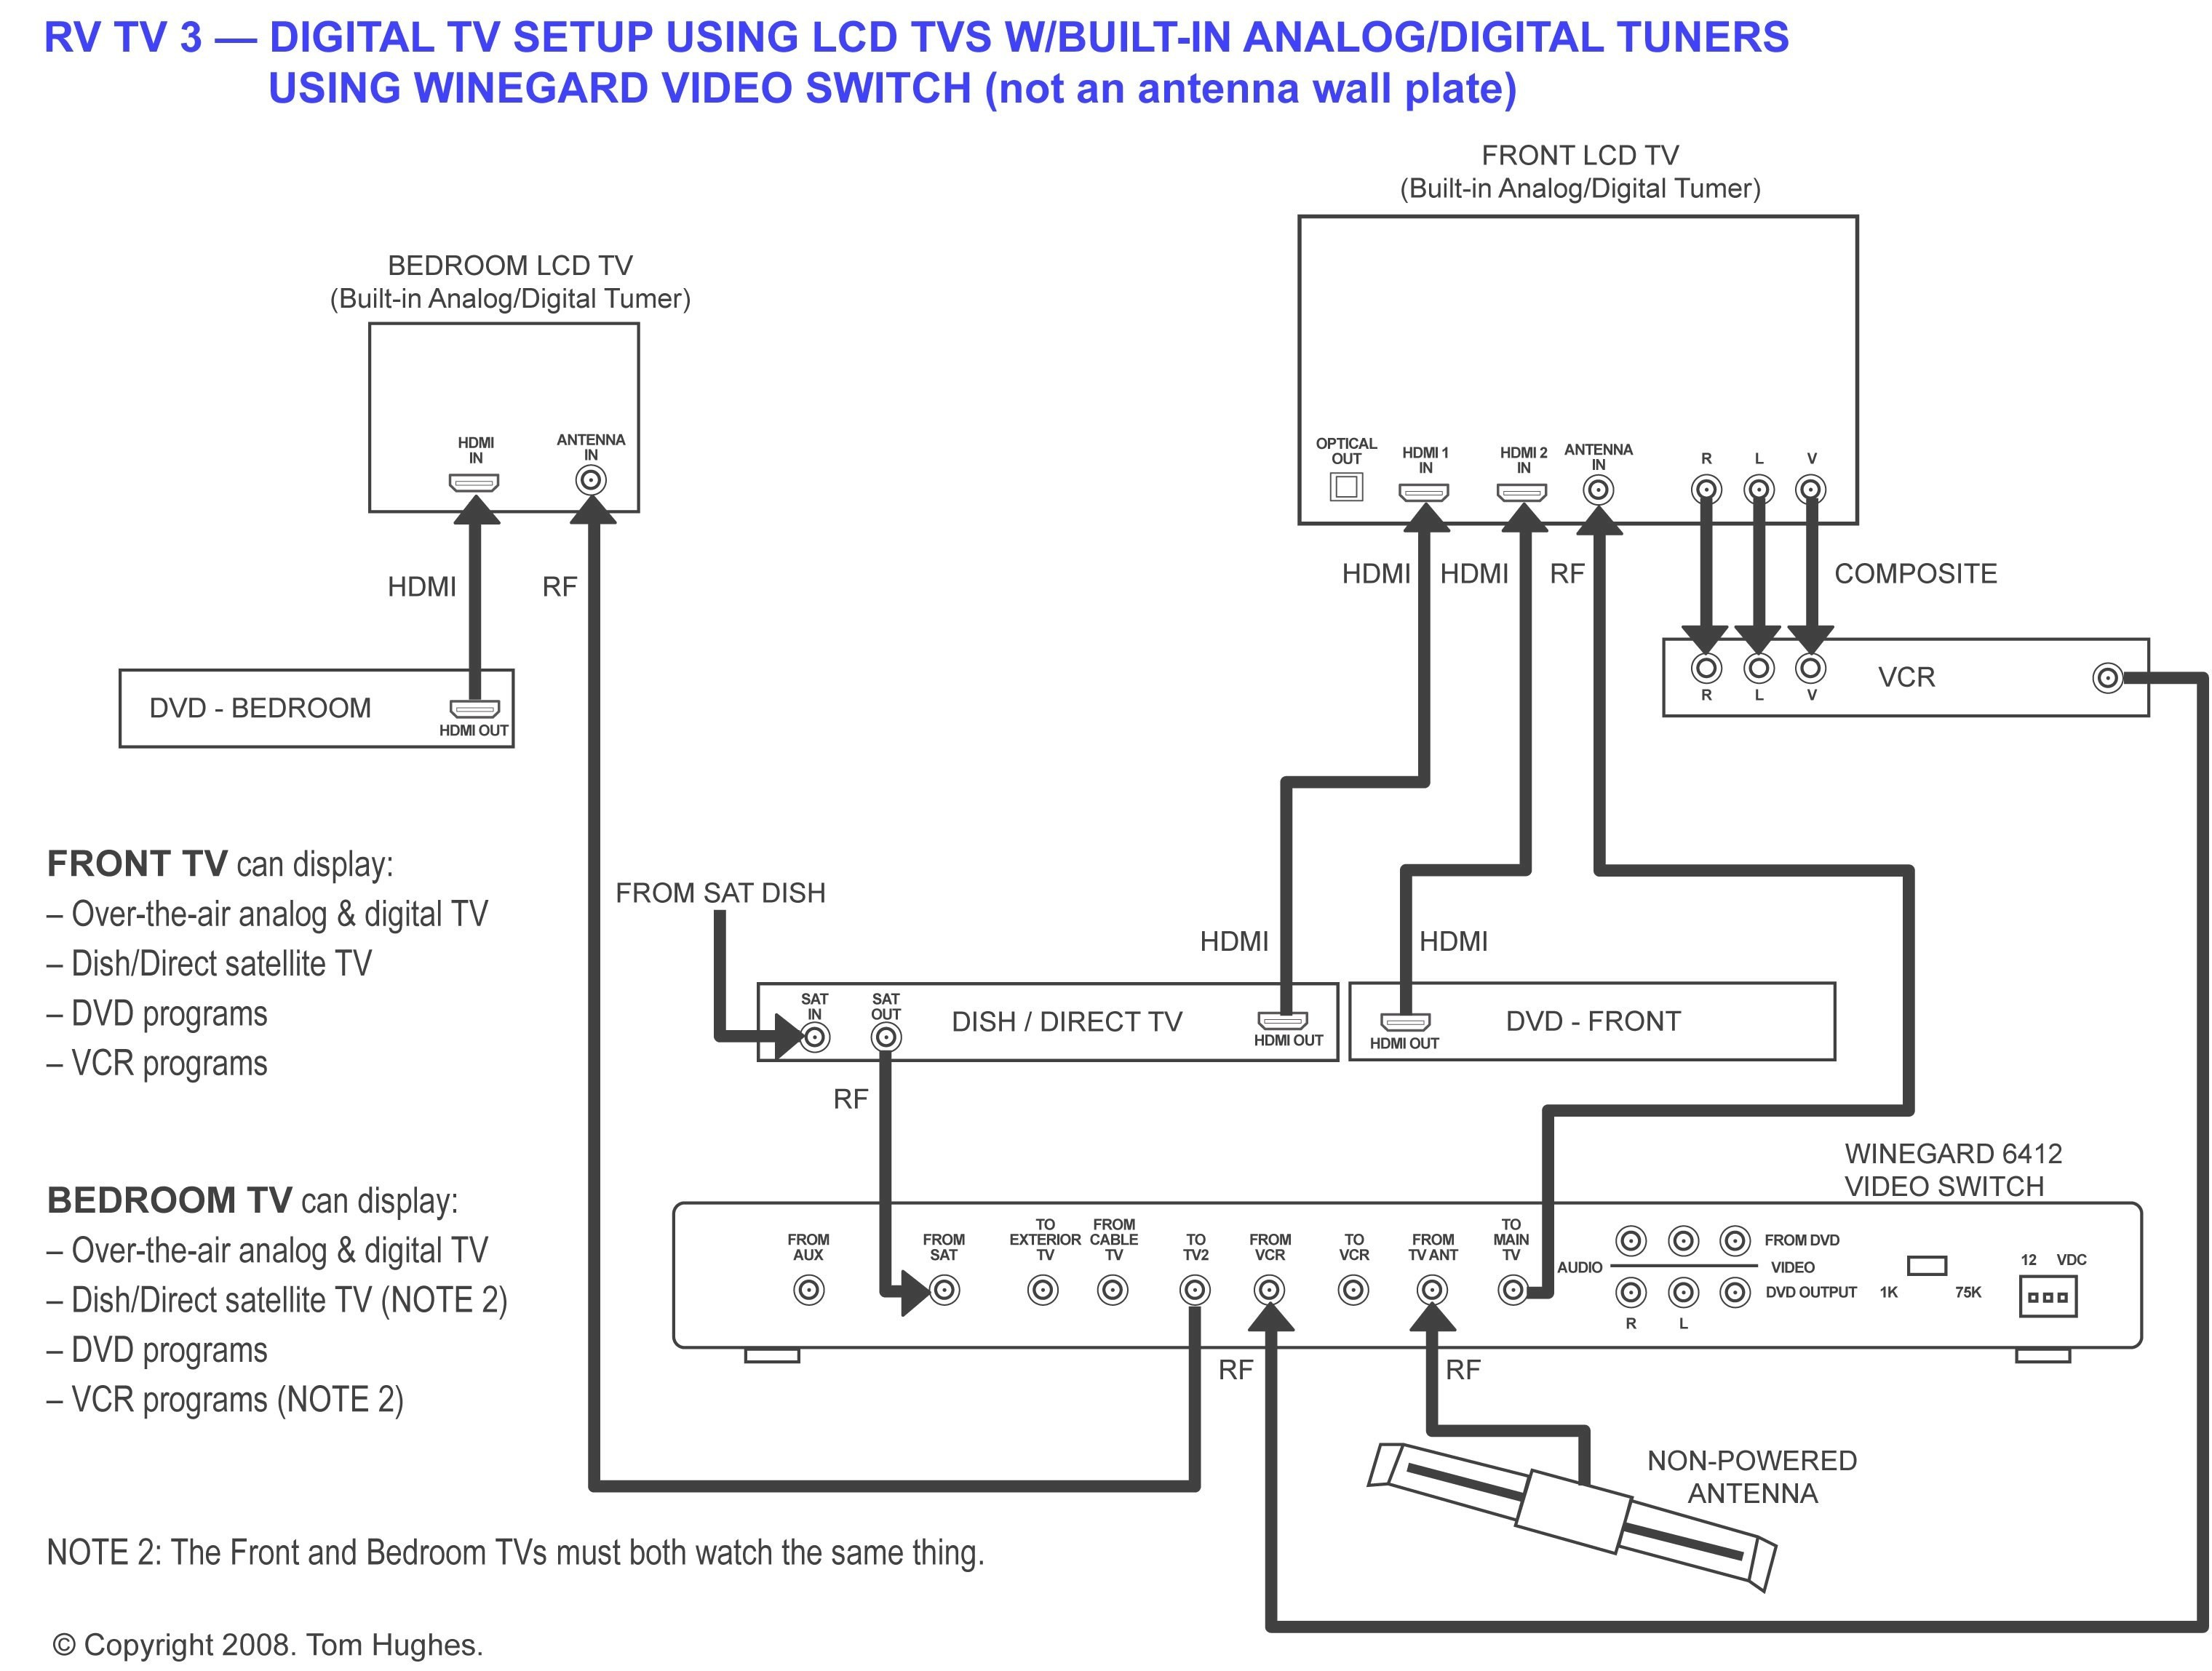 Directv Swm Splitter Wiring Diagram Wiring Diagram for Tv In An Rv Typical Rv Wiring Diagram Wiring Of Directv Swm Splitter Wiring Diagram